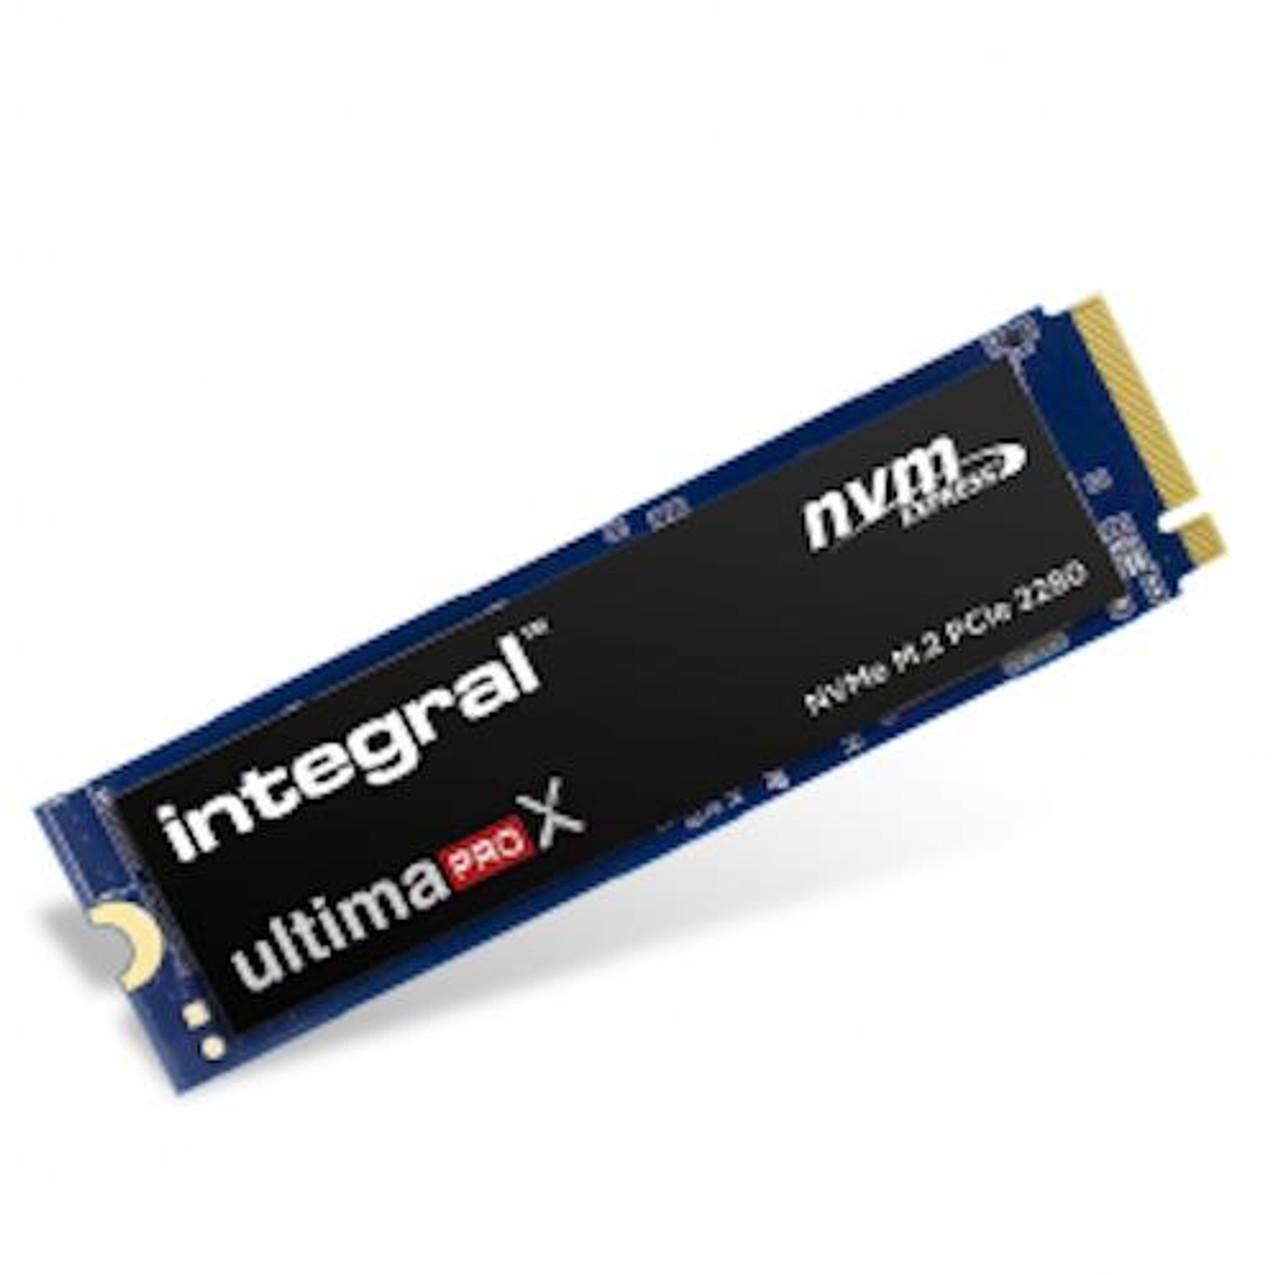 INSSD1TM280NUPX2-1TB NVME PCIe SSD